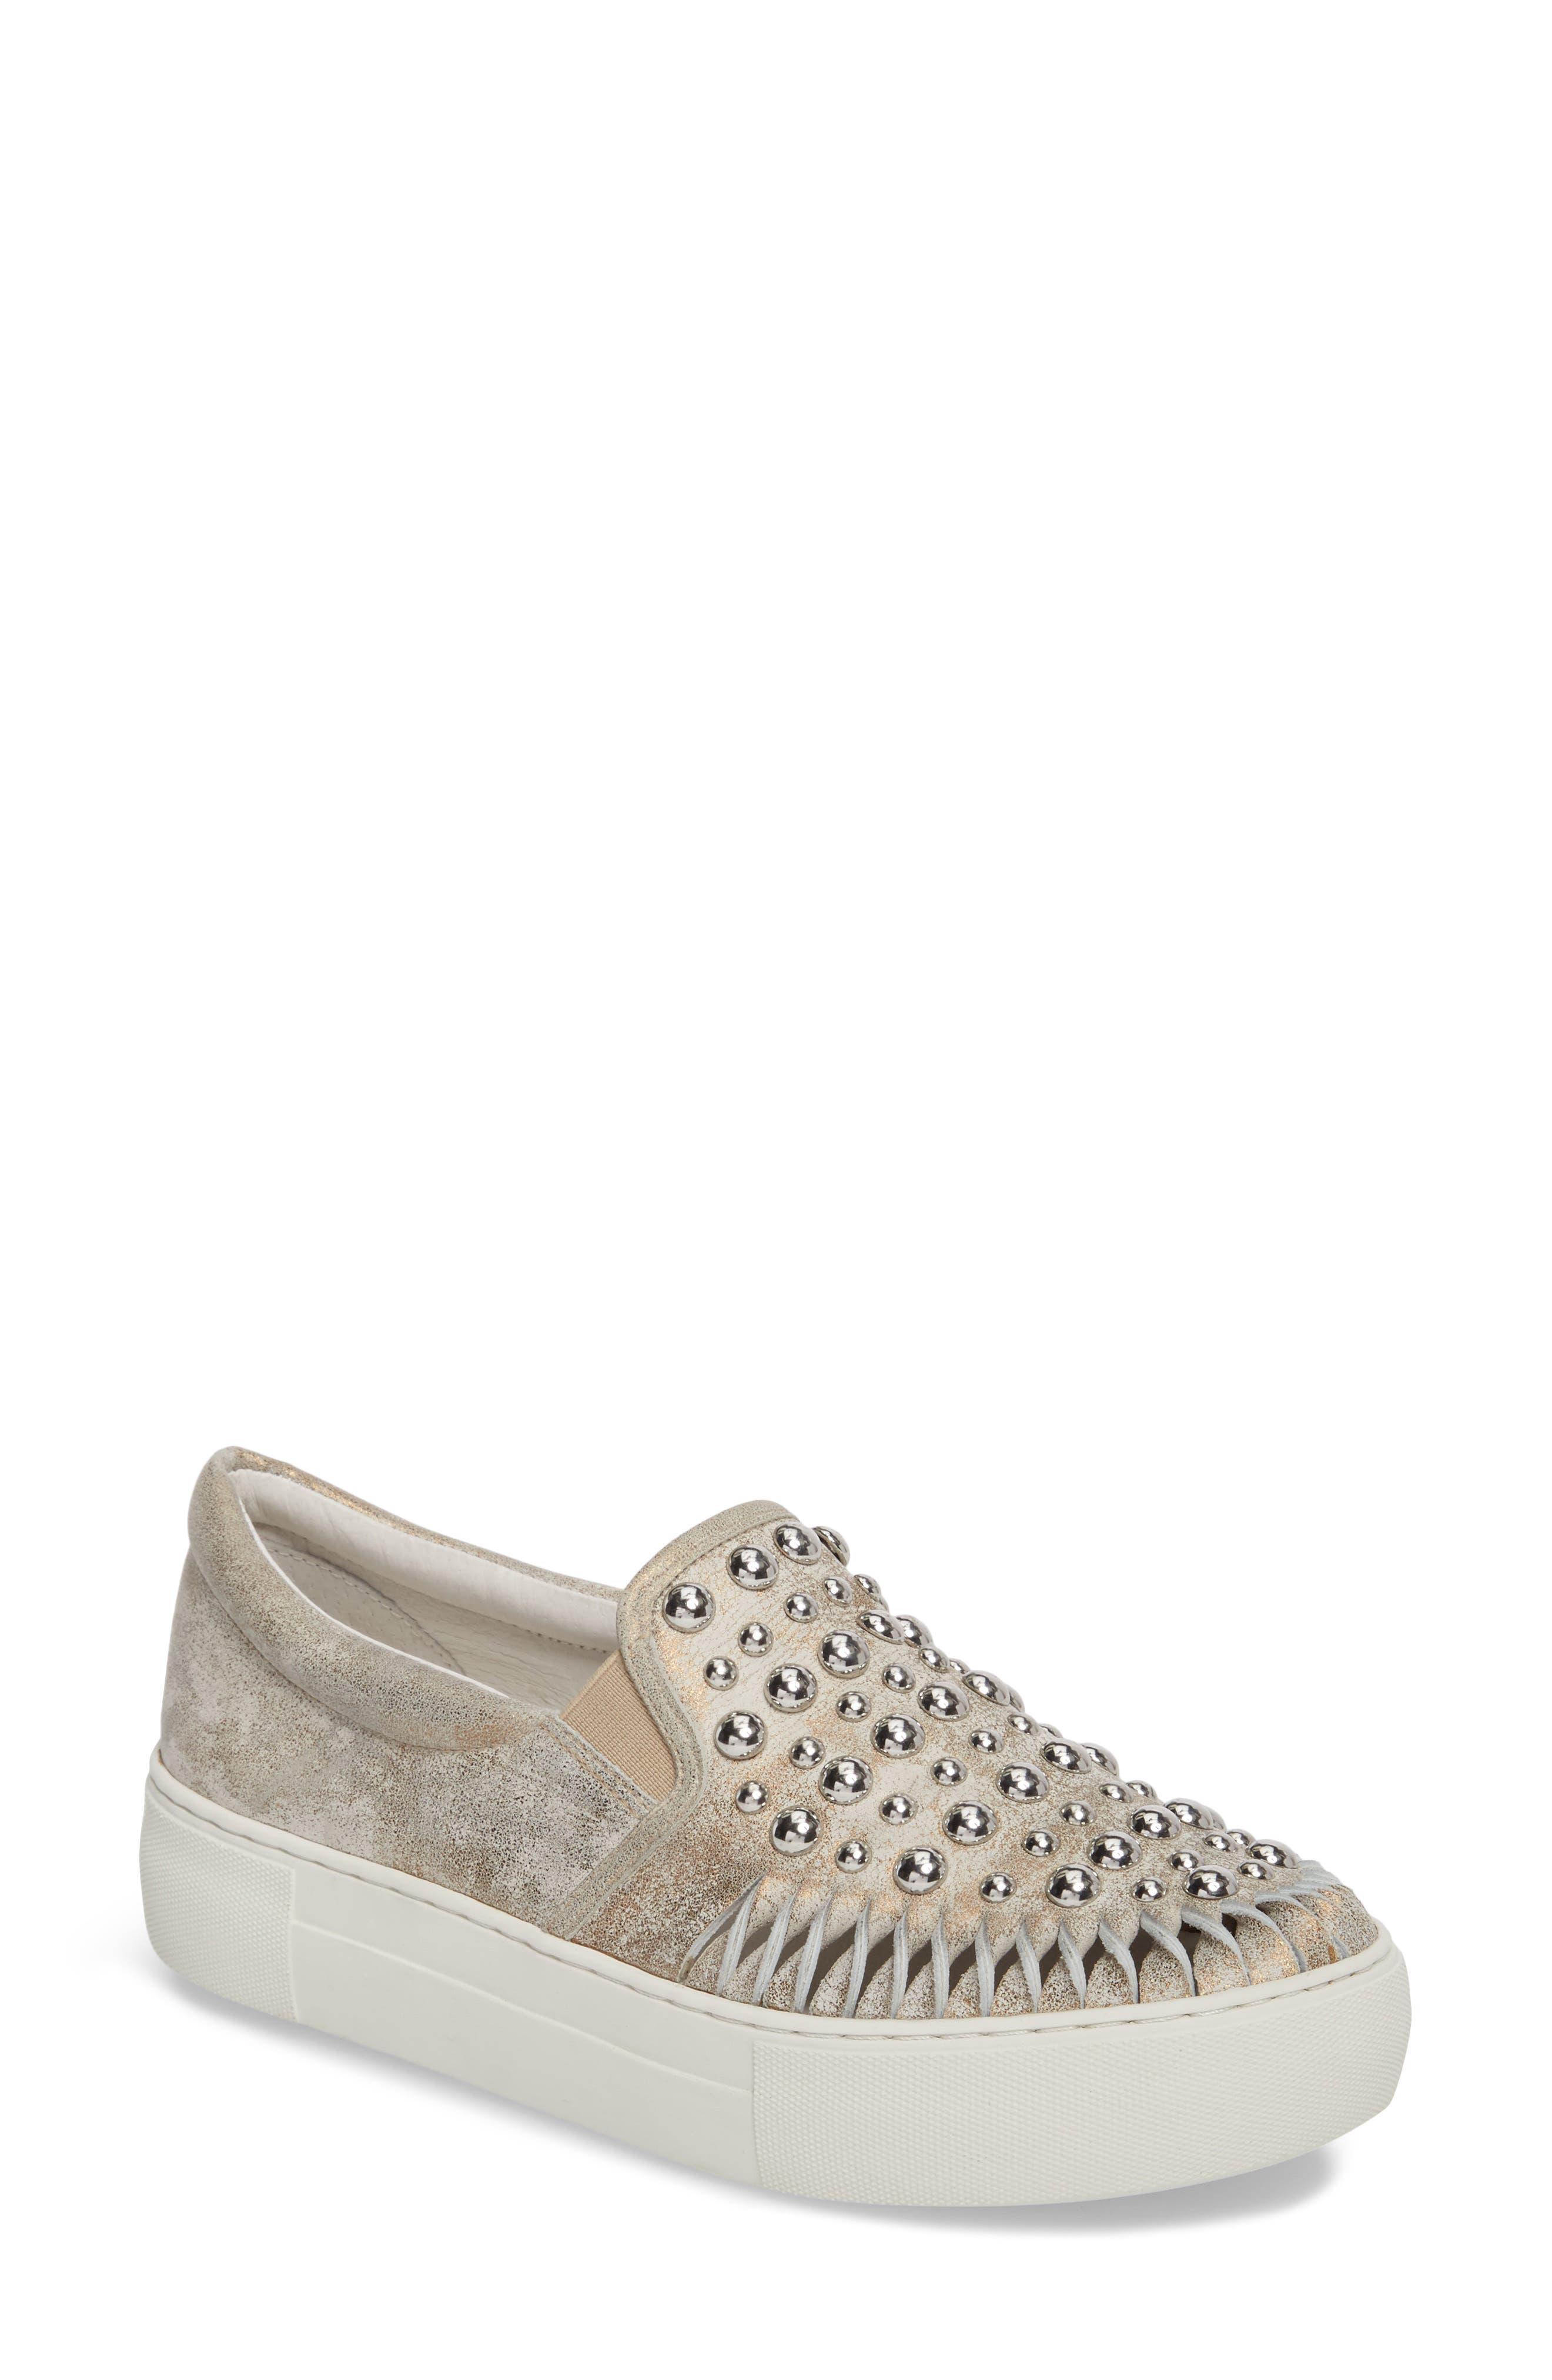 AZT Studded Slip-On Sneaker,                             Main thumbnail 1, color,                             Bronze Leather